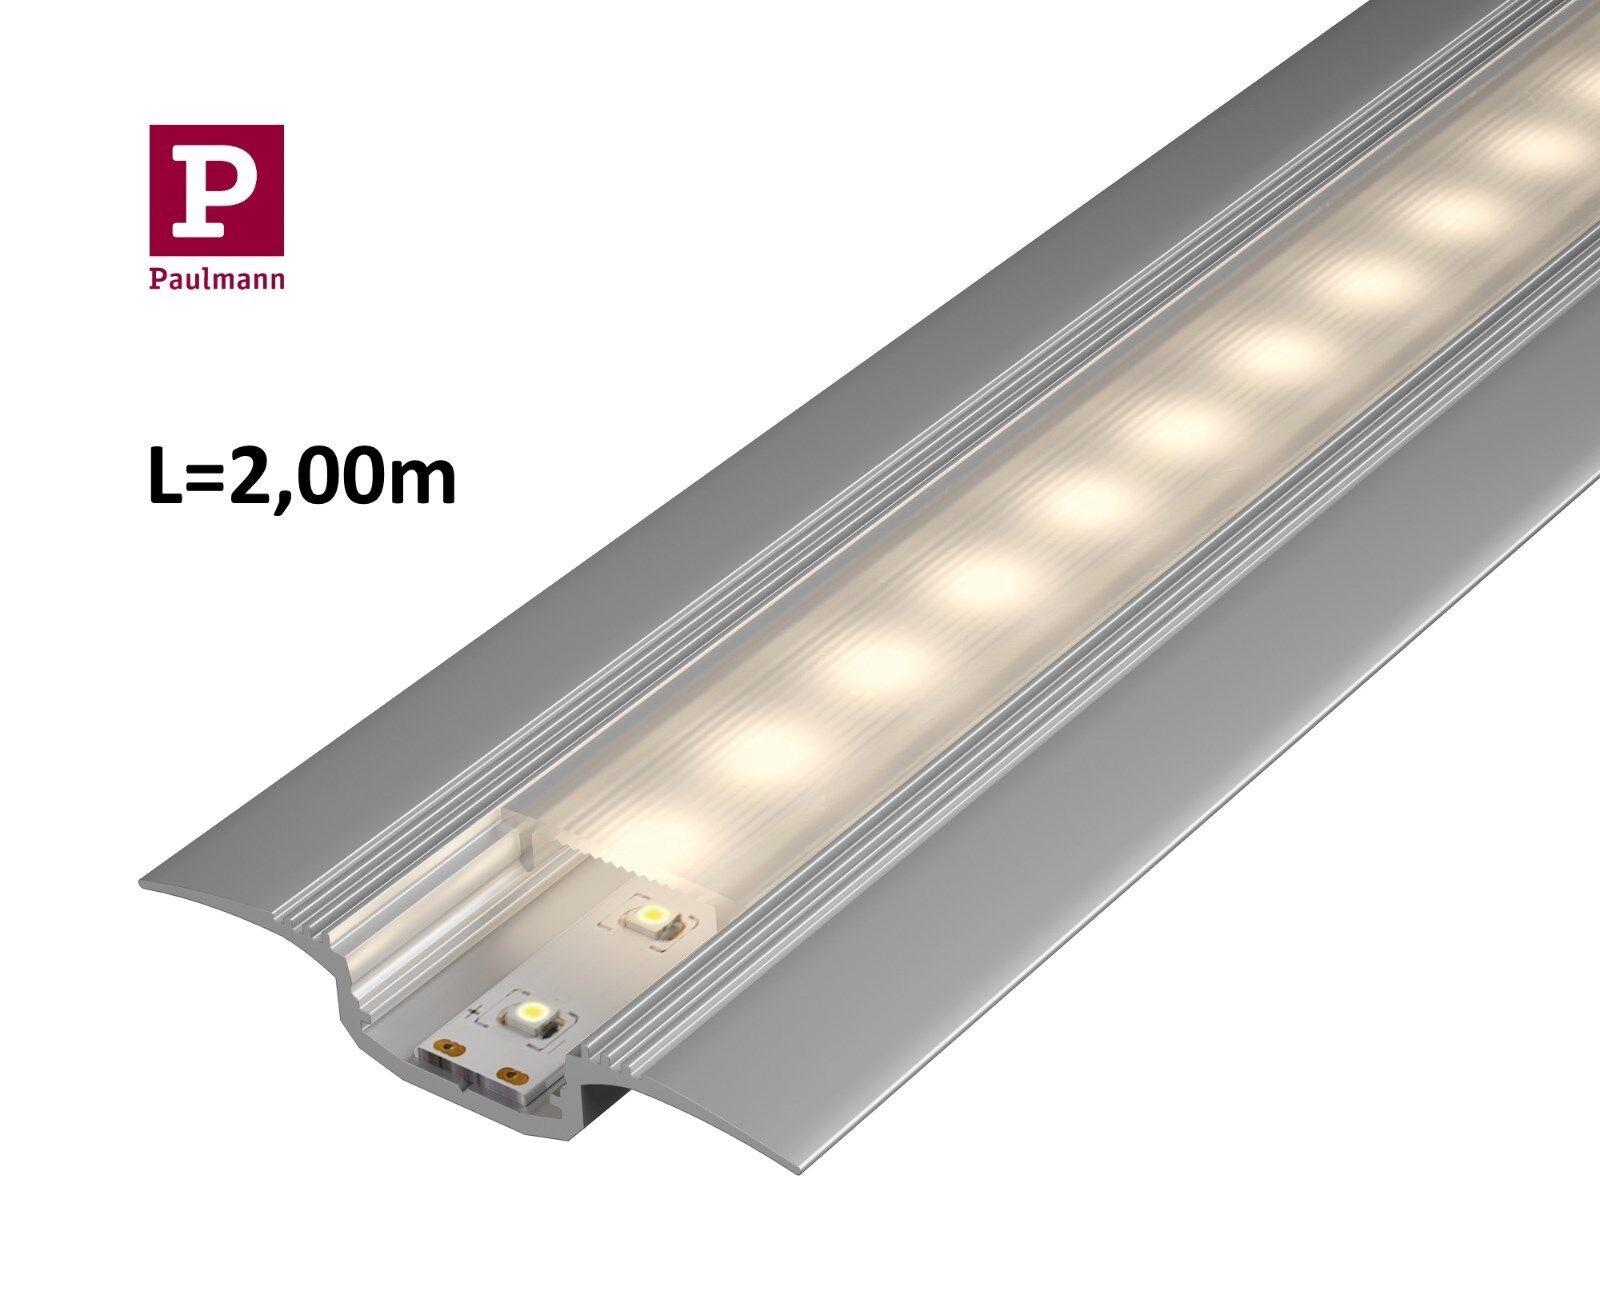 Paulmann Step LED Bodenübergangs Bodenübergangs Bodenübergangs Profil mit Diffusor in 1 bis 2m Alu eloxiert  | Online Outlet Shop  74d2e0